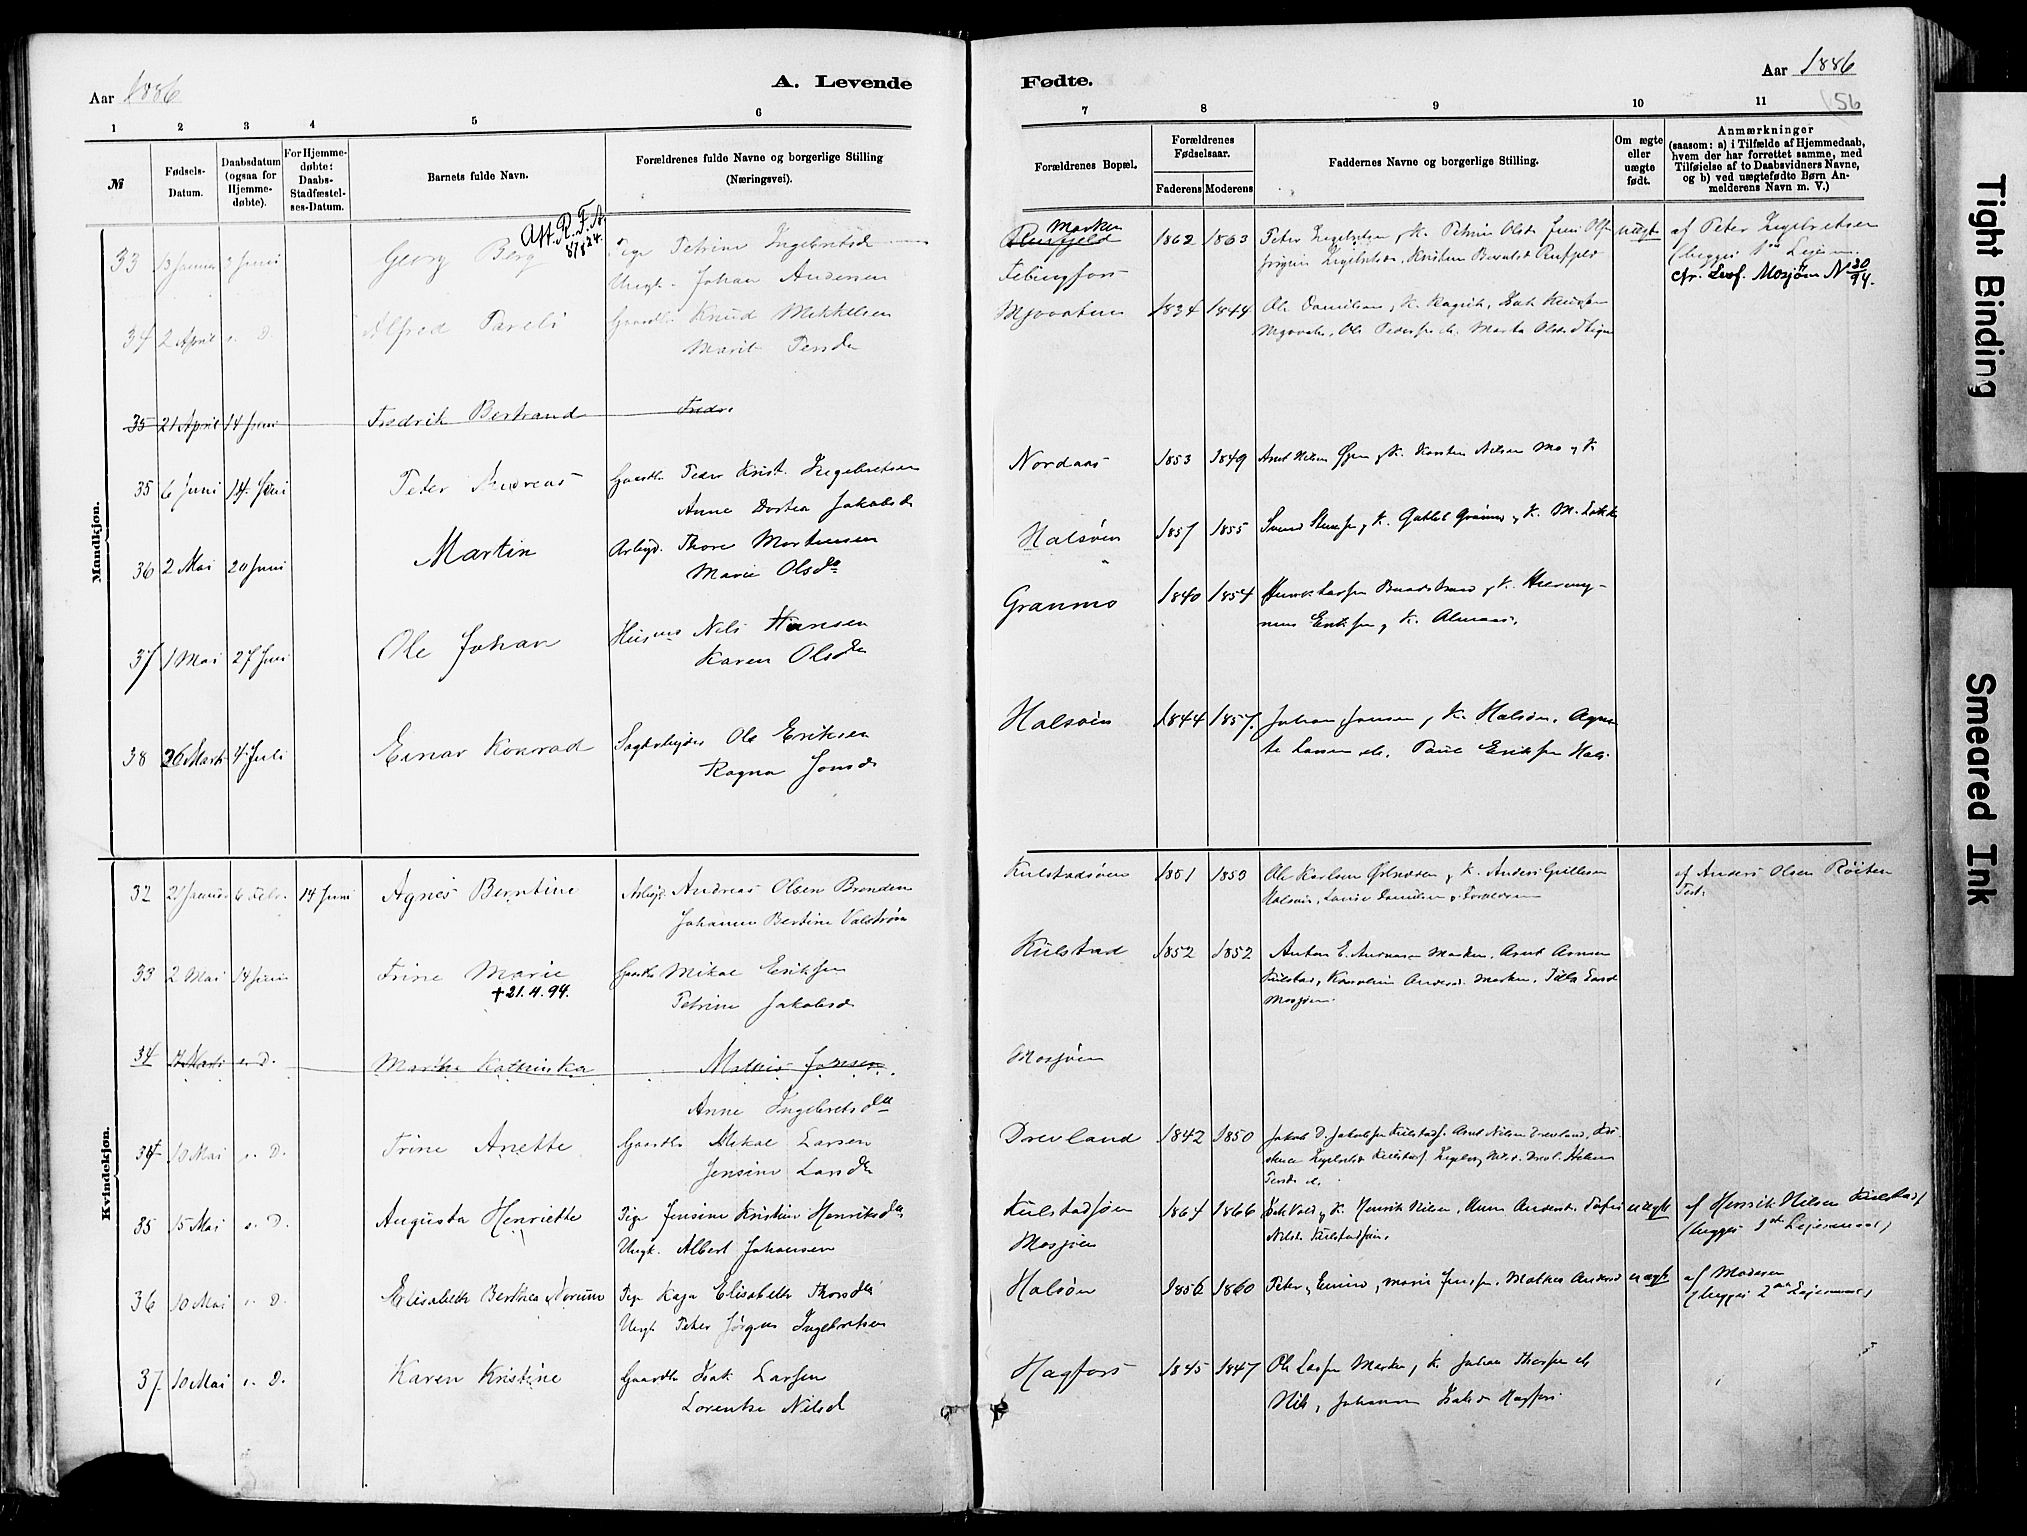 SAT, Ministerialprotokoller, klokkerbøker og fødselsregistre - Nordland, 820/L0295: Ministerialbok nr. 820A16, 1880-1896, s. 56